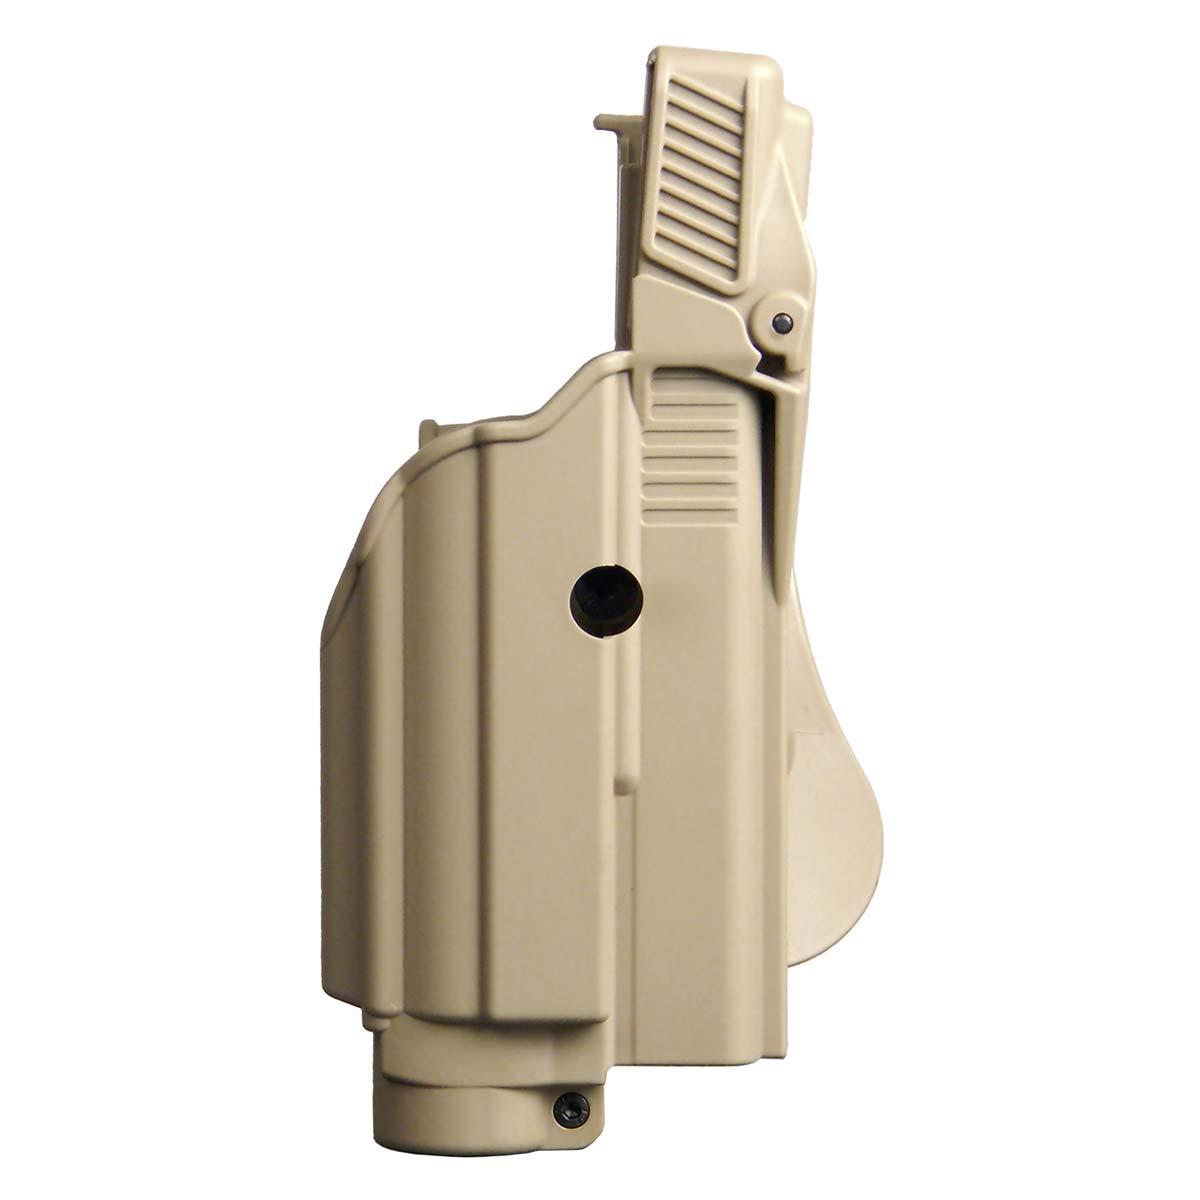 imi-defense-tactical-laser-light-level-2-holster-tan - ZAHAL